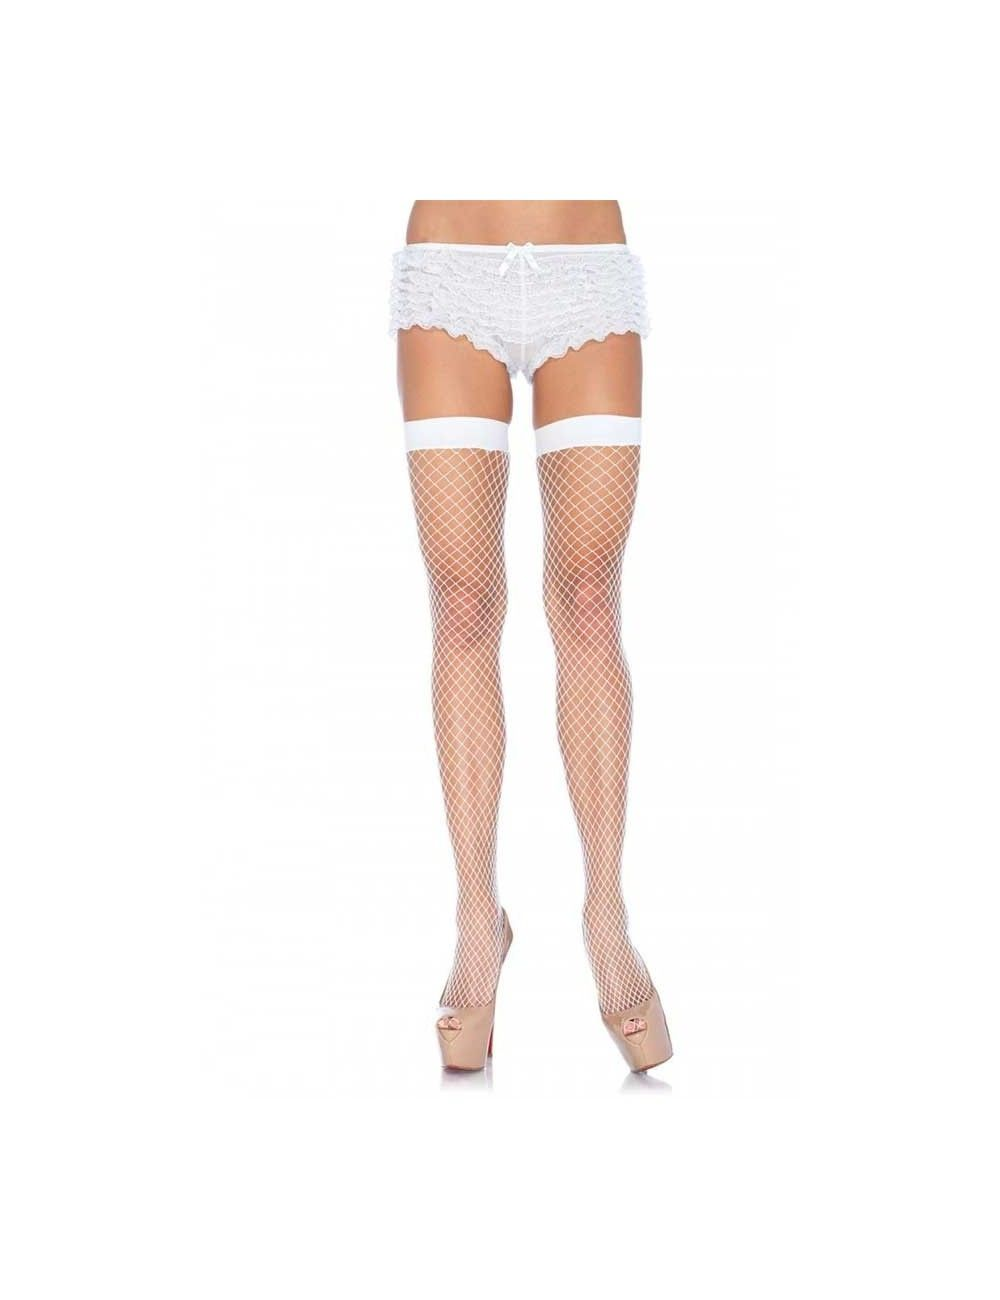 Bas résille blanc & nylon LEG AVENUE